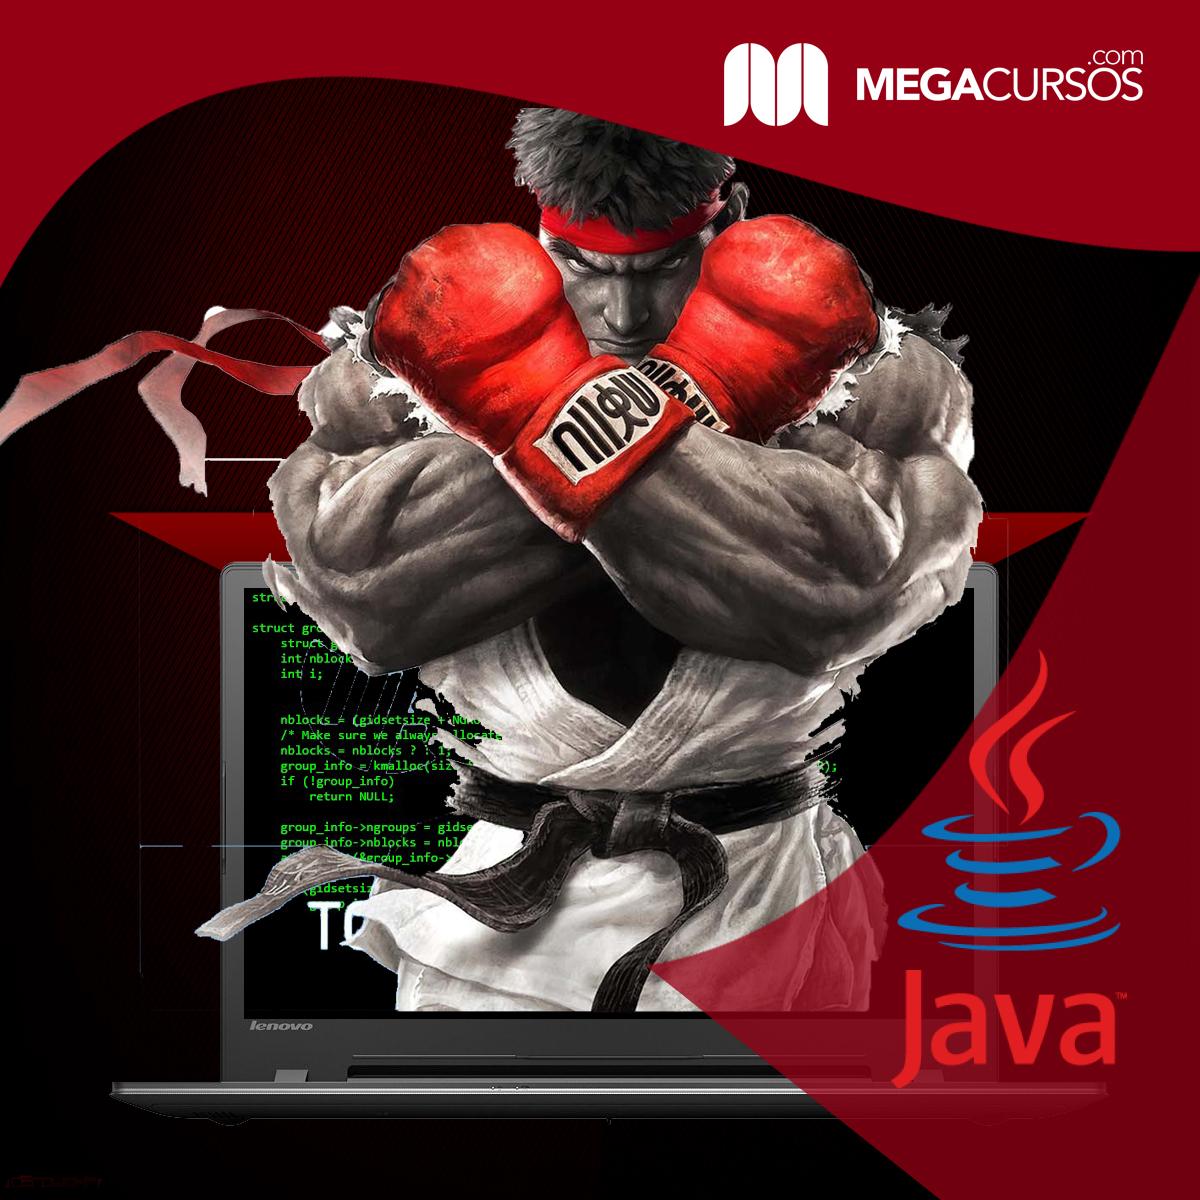 Java Promocional